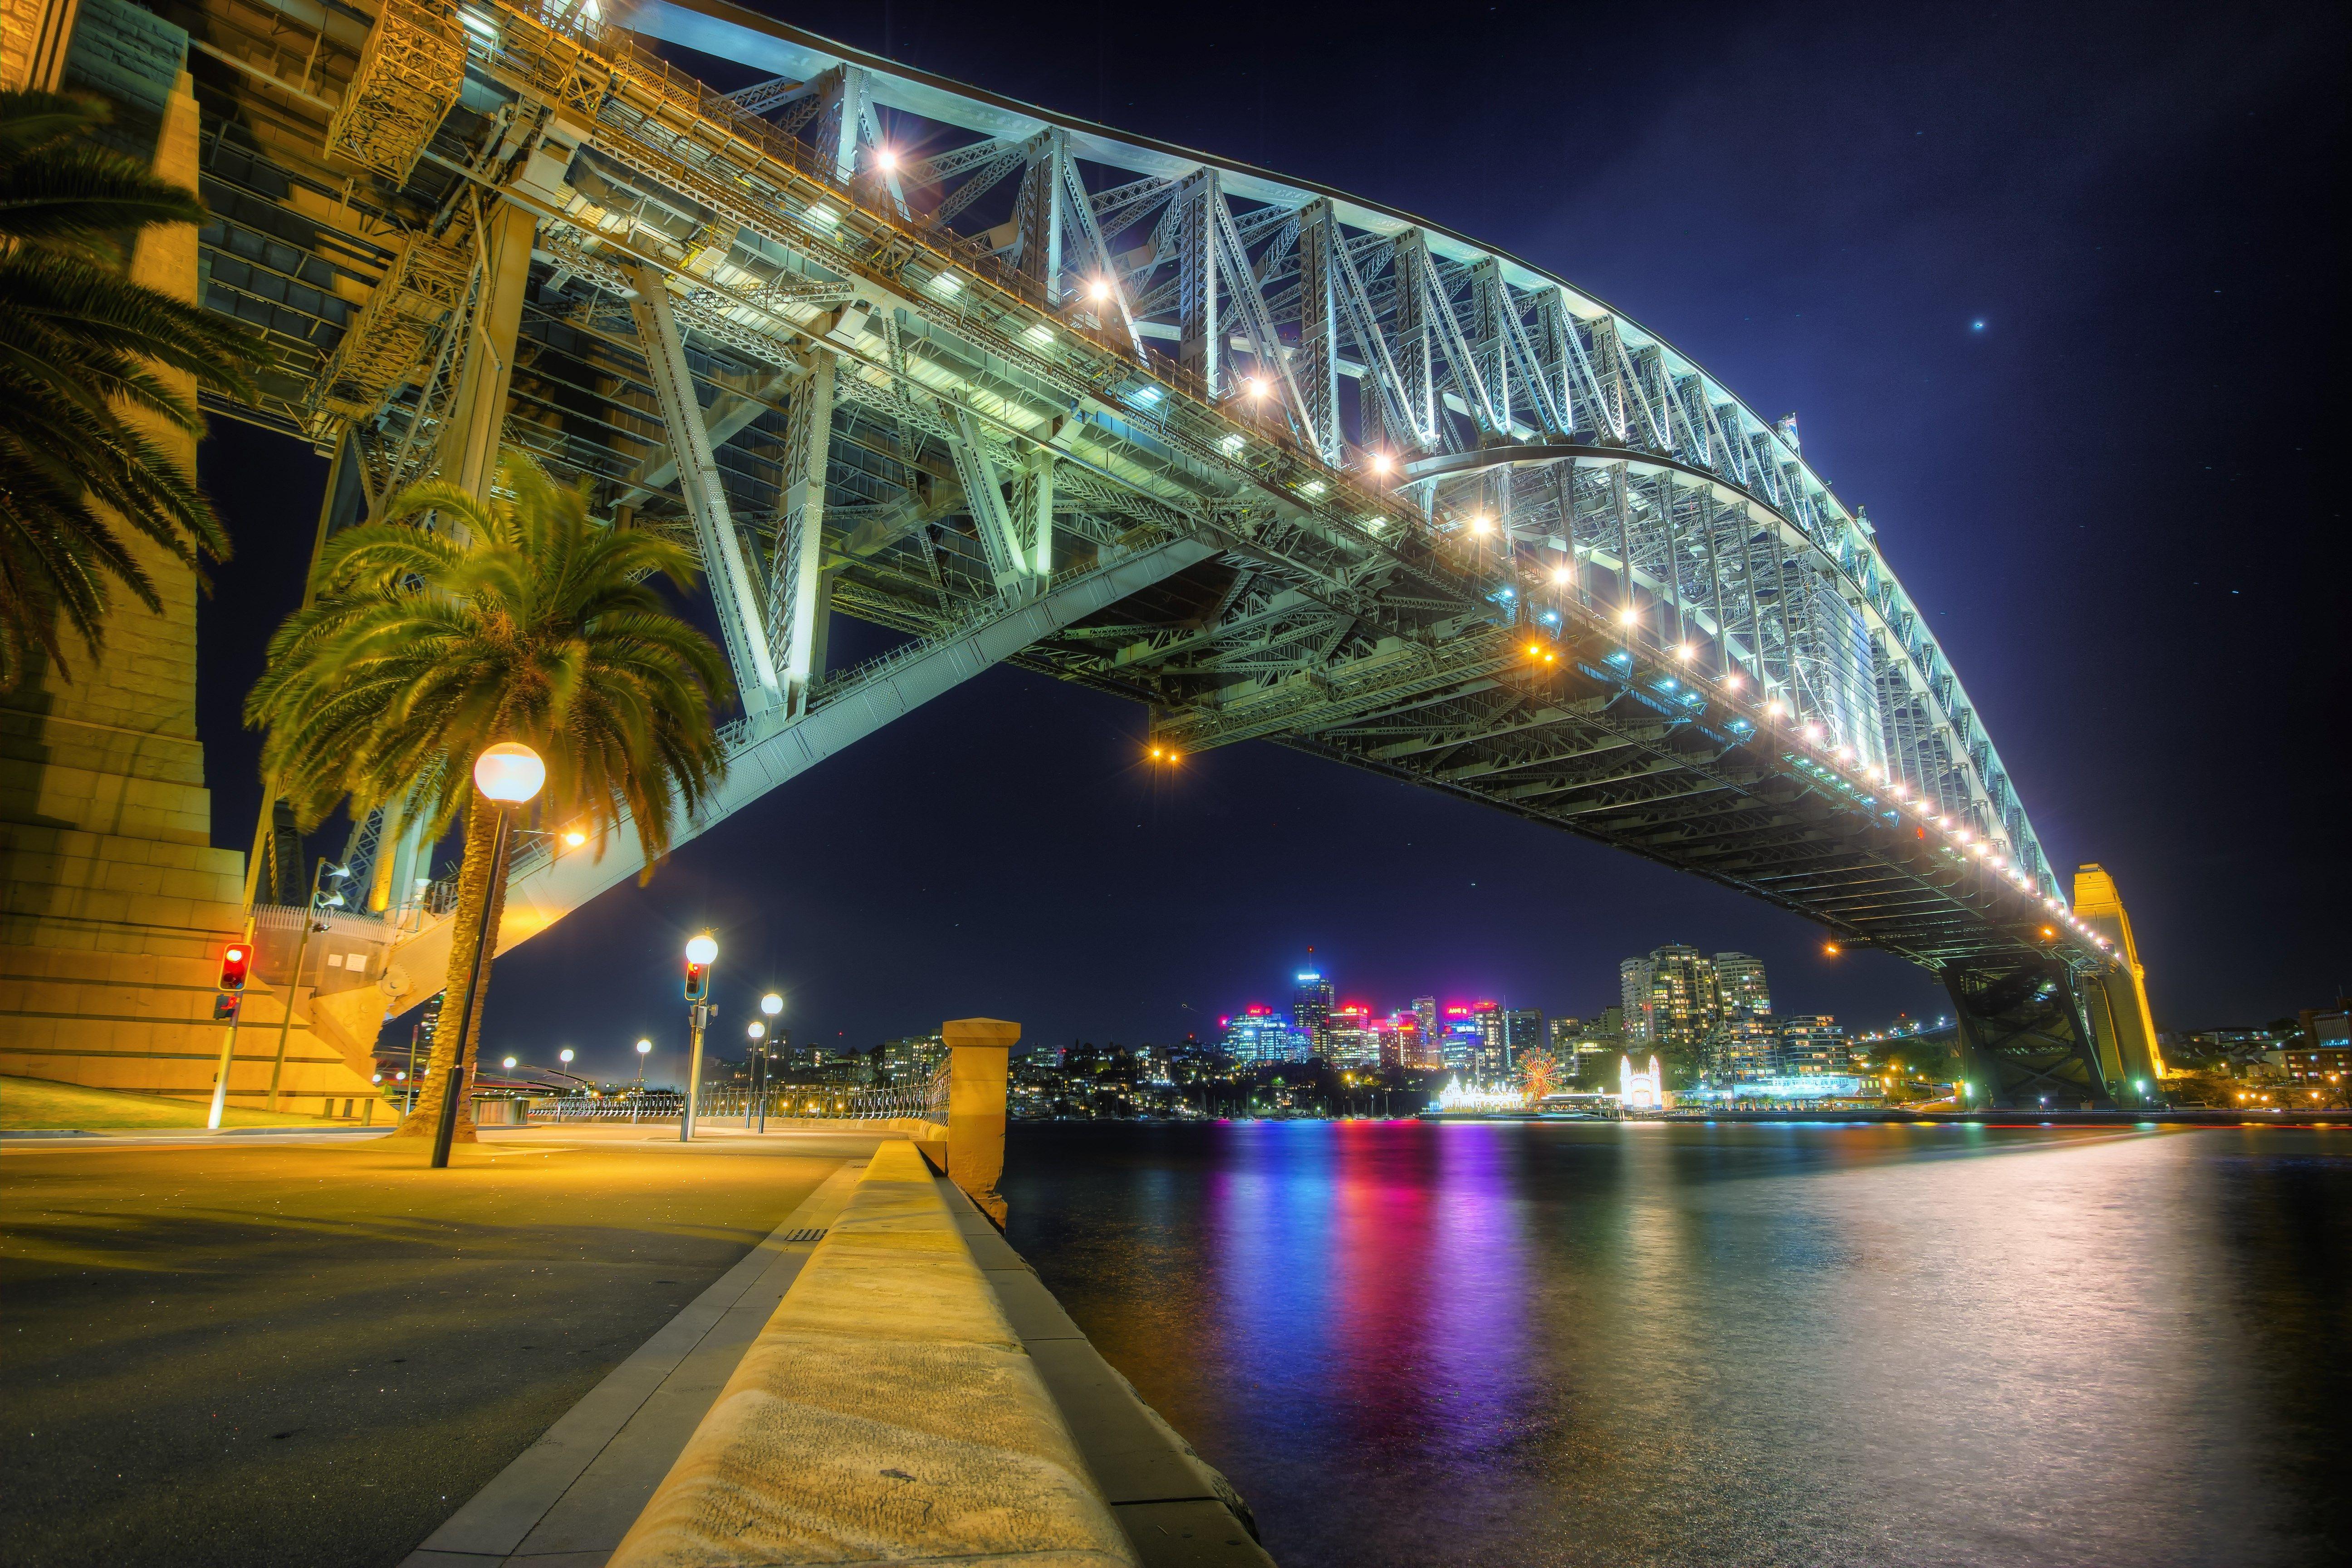 Sydney harbour bridge wallpaper collection 5184x3456 gogolmogol sydney harbour bridge wallpaper collection 5184x3456 altavistaventures Choice Image